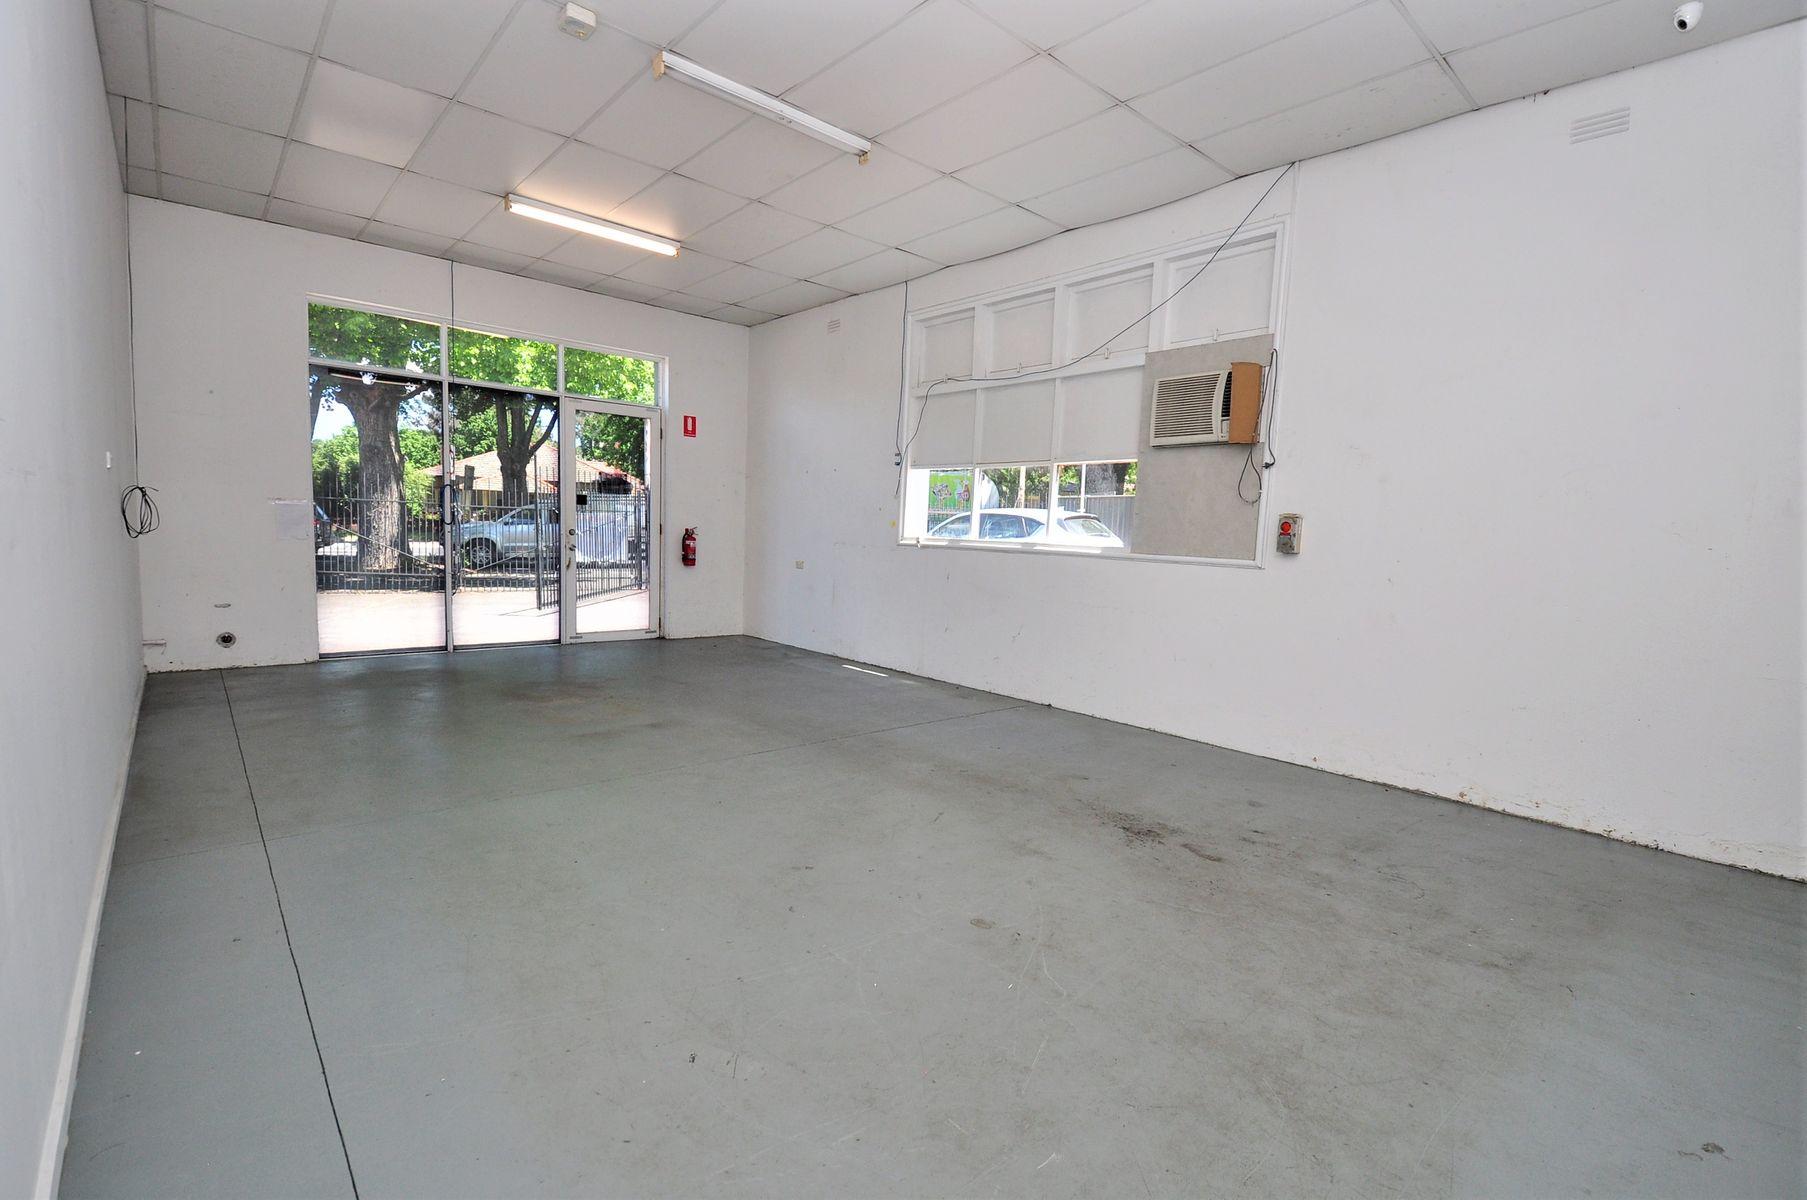 154-156 High Street, Bendigo, VIC 3550